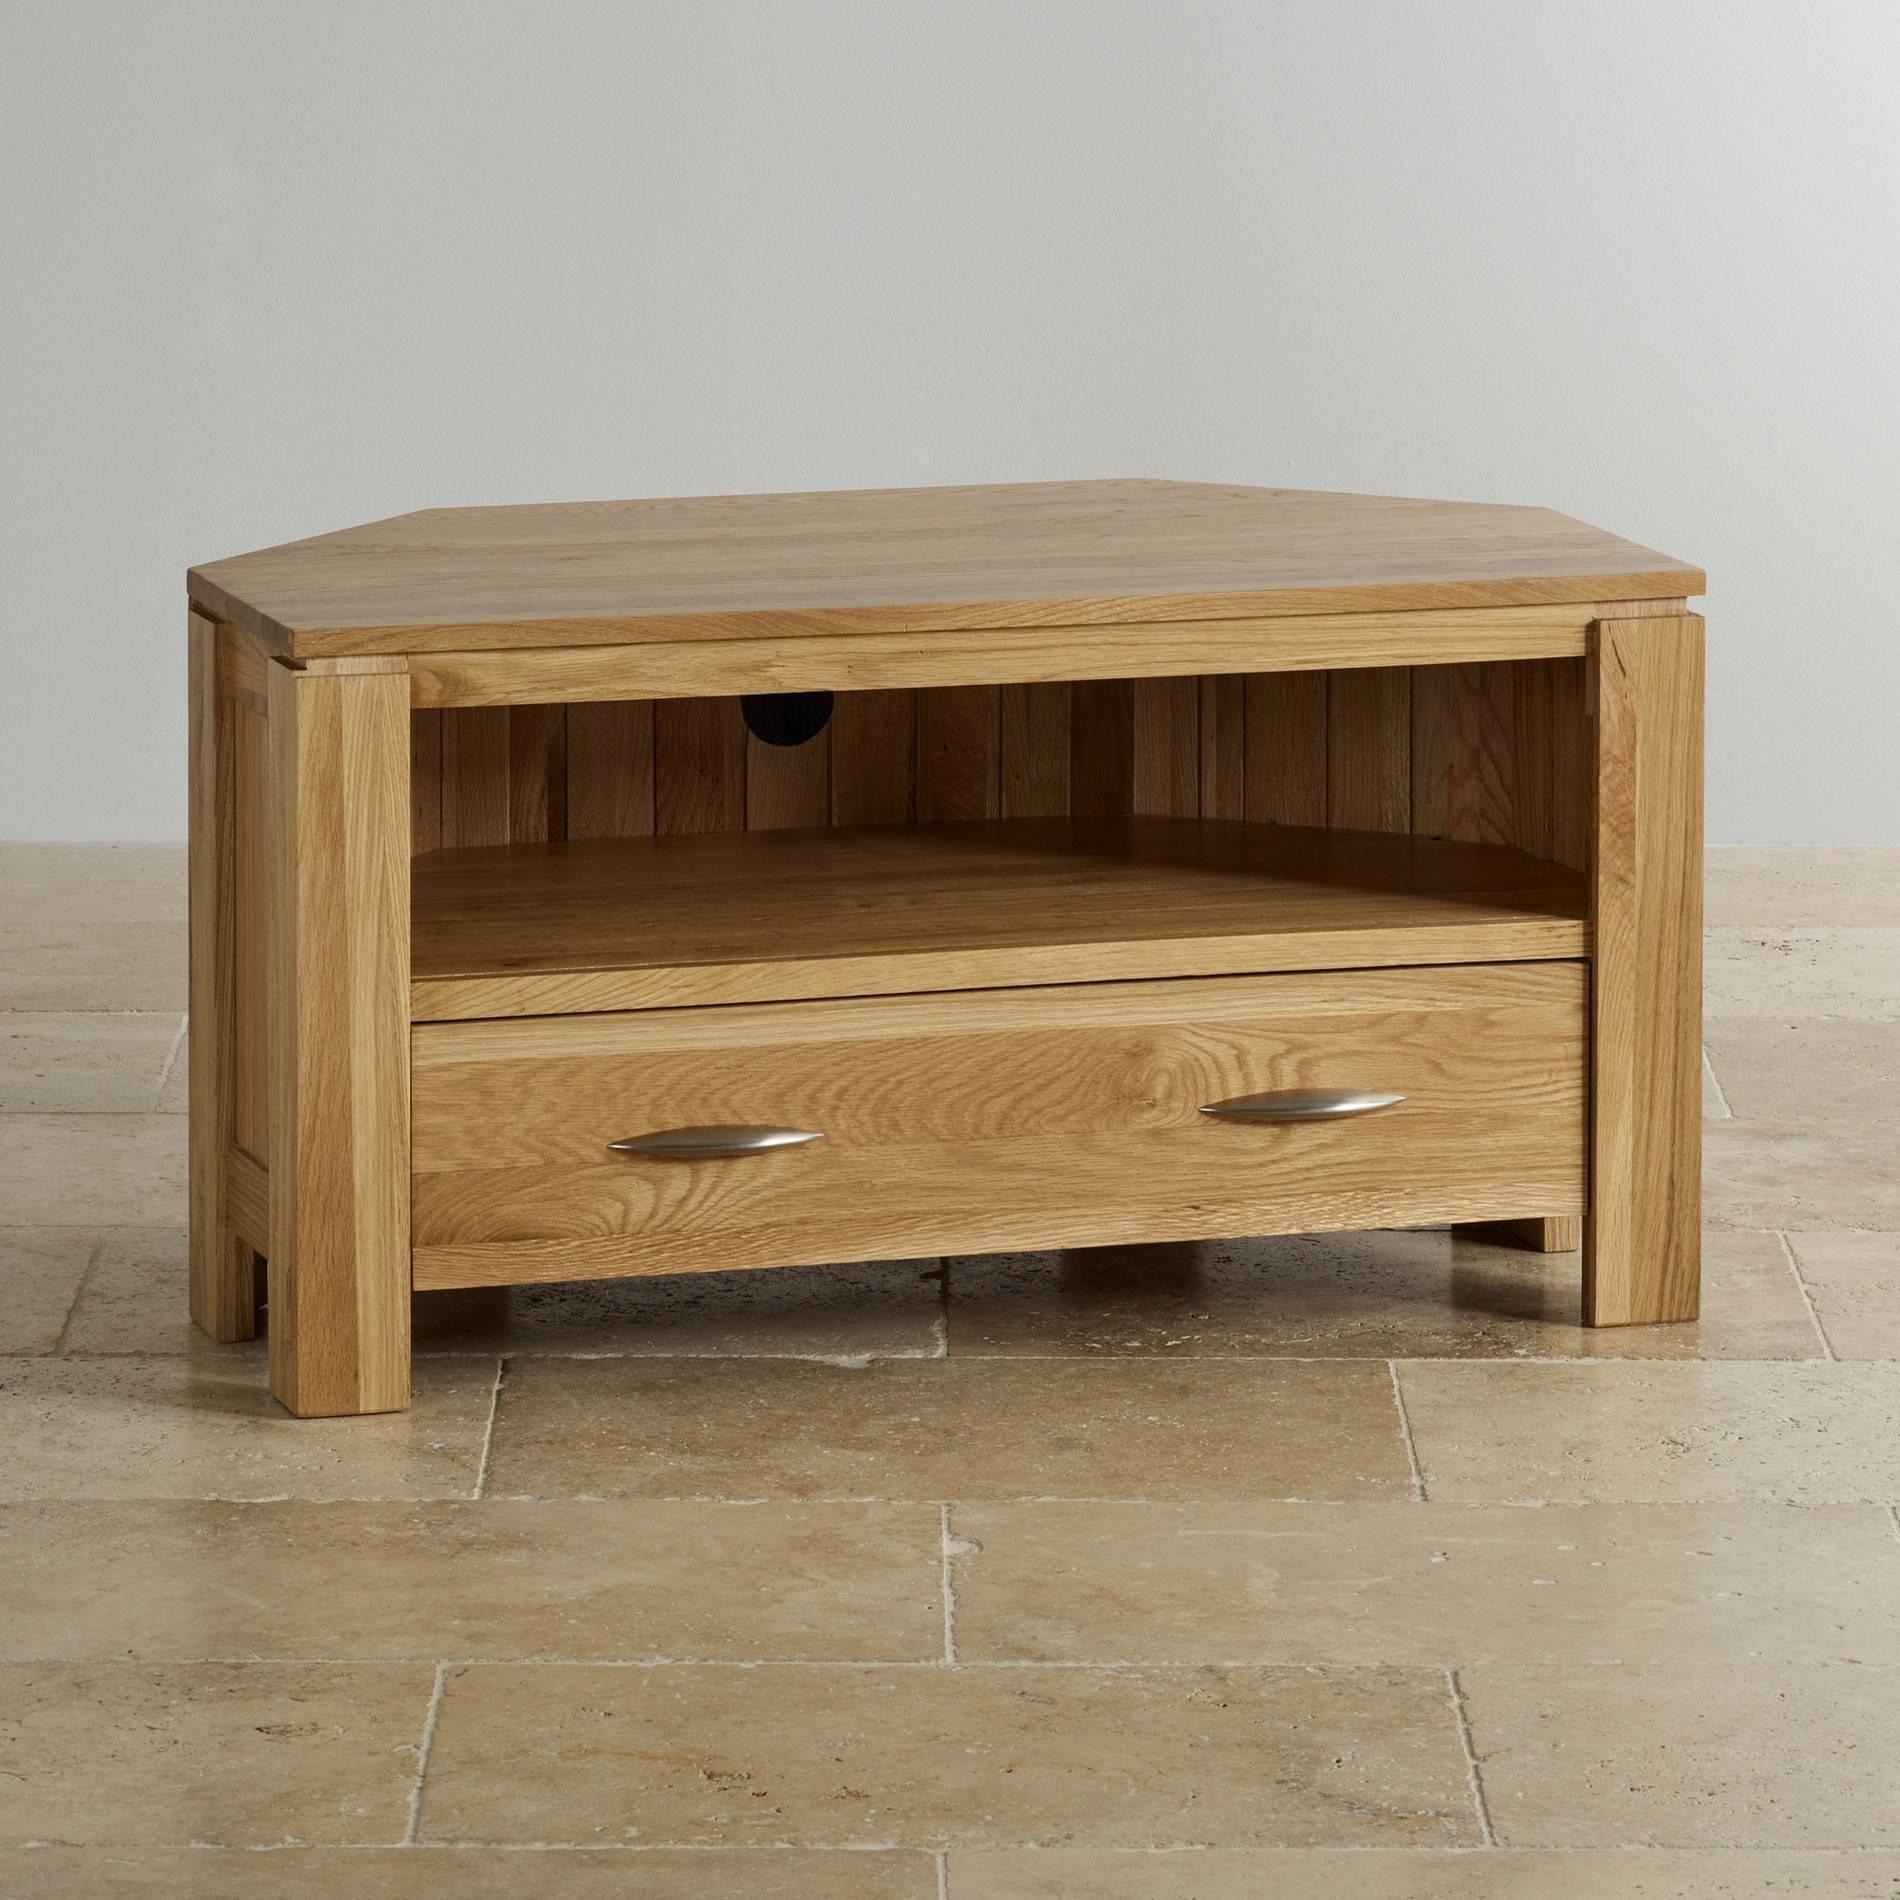 Galway Corner Tv + Dvd Cabinet In Solid Oak | Oak Furniture Land Within Oak Corner Tv Cabinets (View 3 of 15)